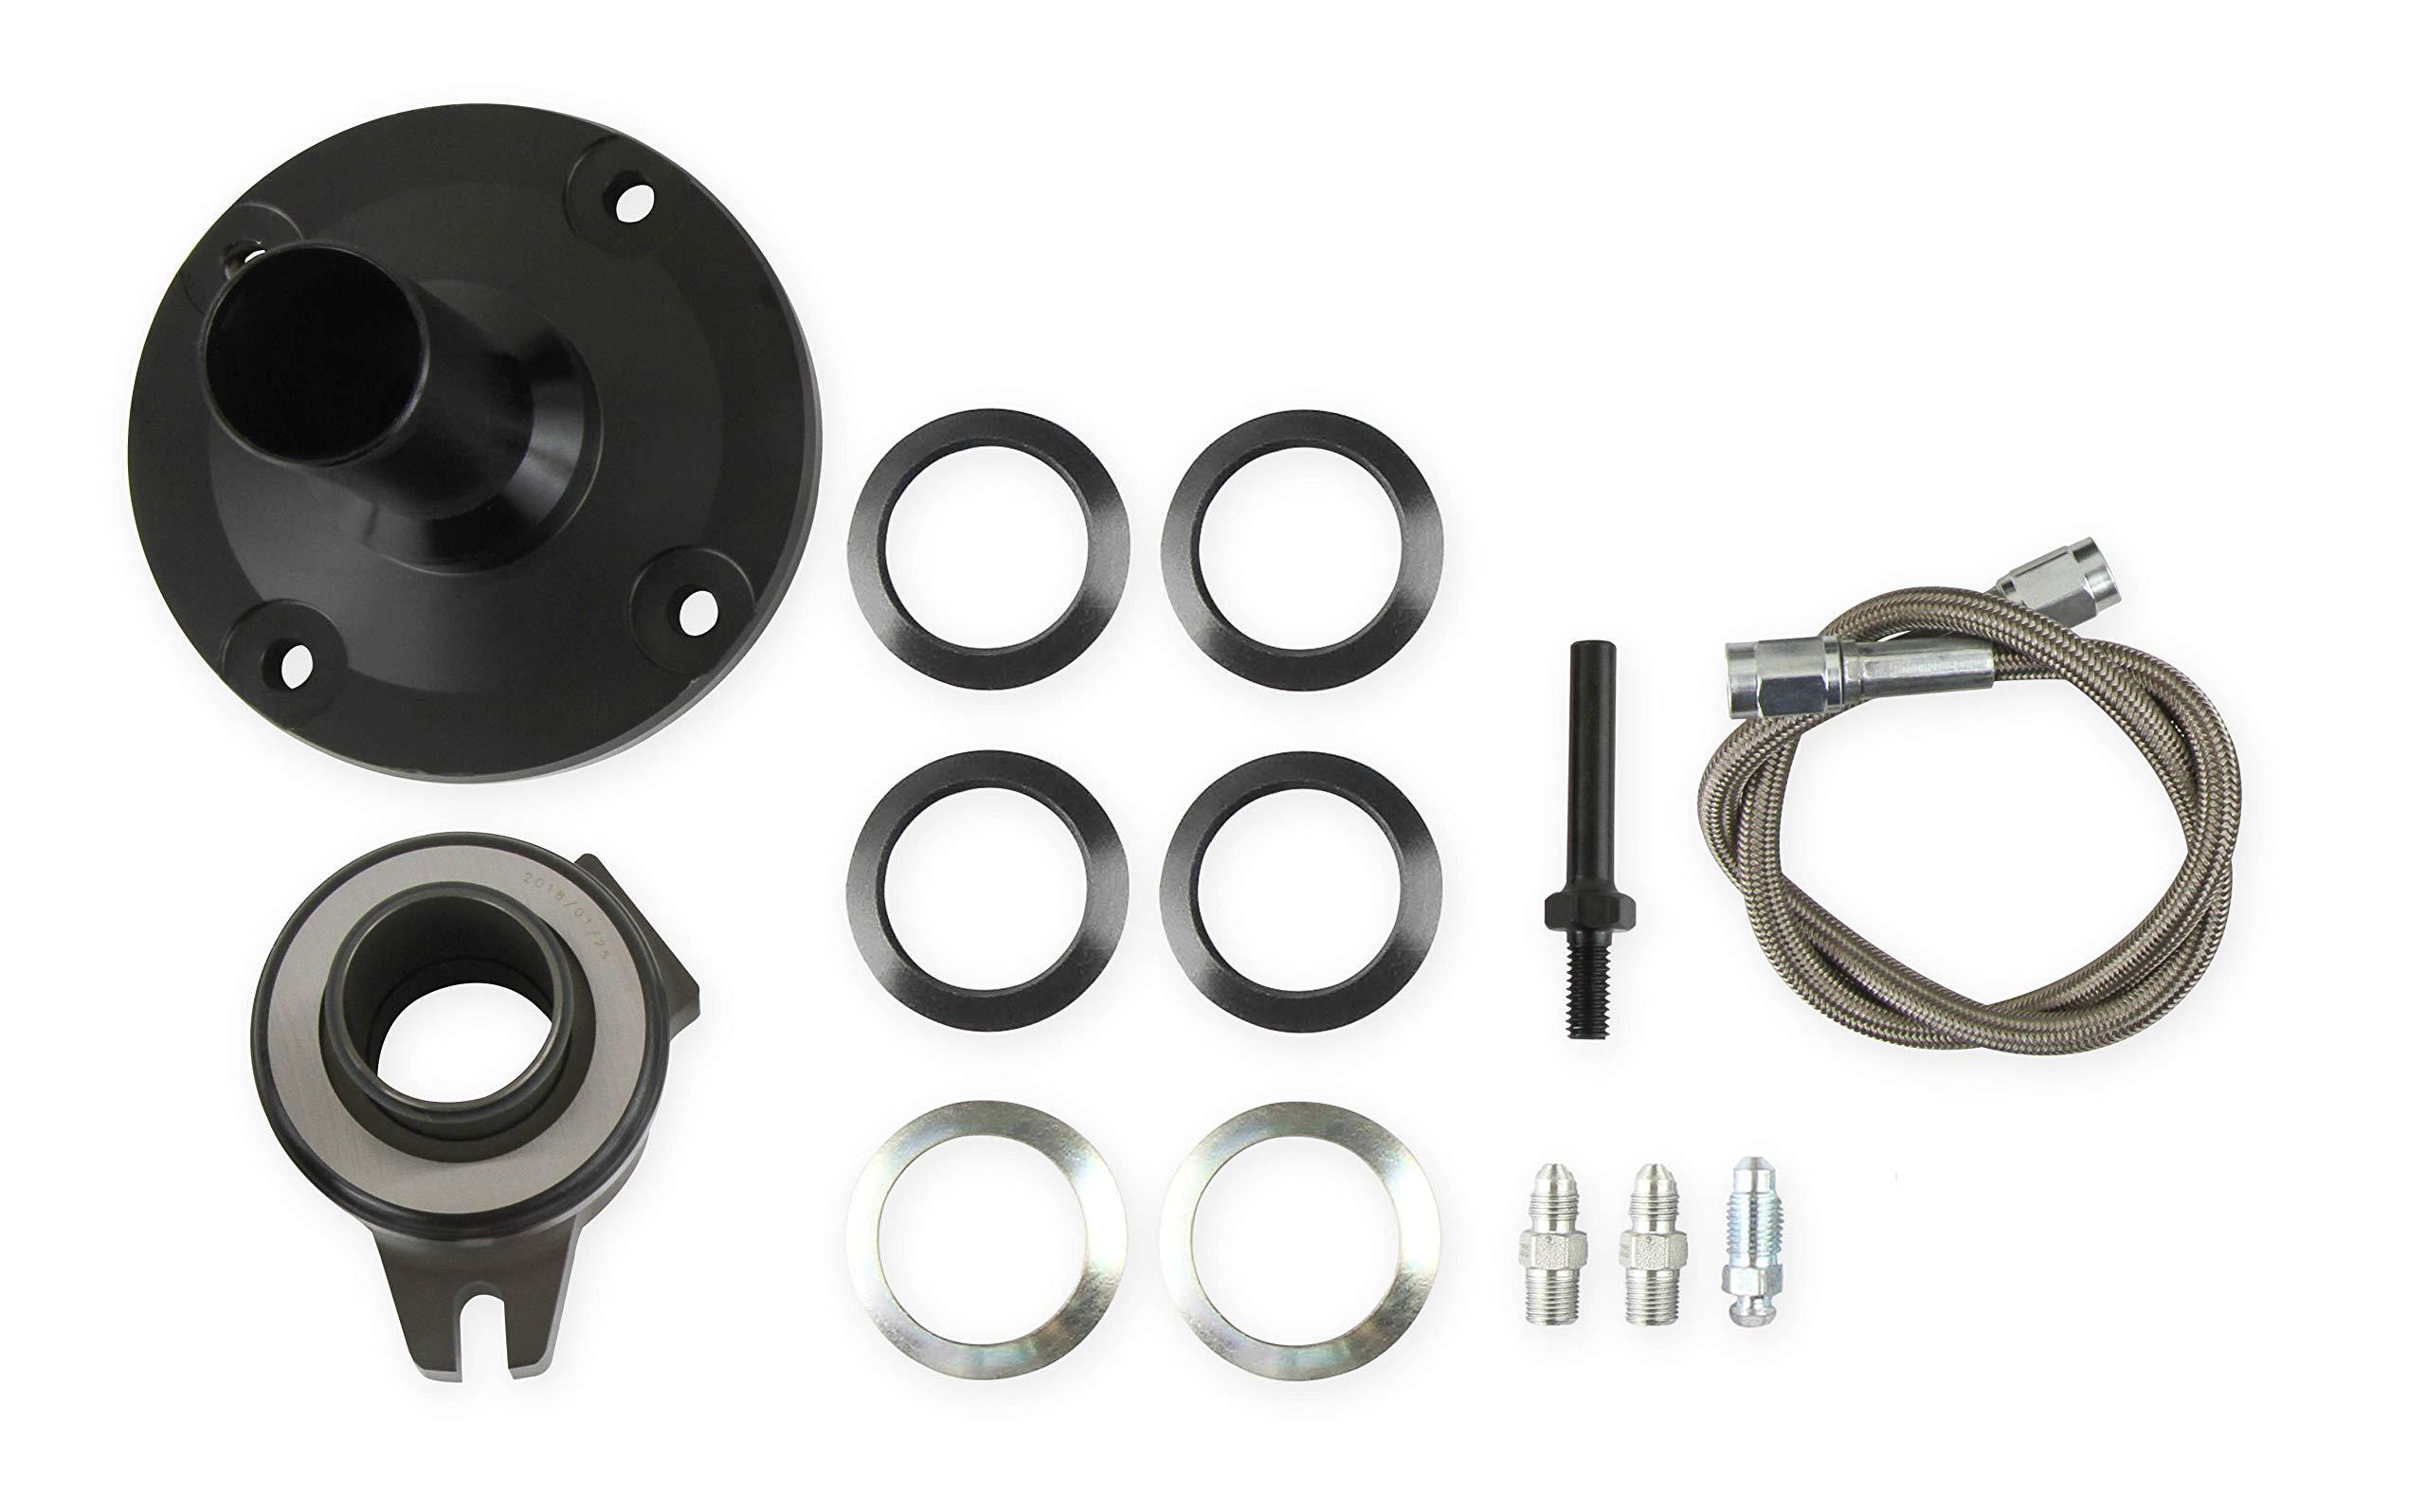 Hays 82-103 Hydraulic Release Bearing Kit for Ford Tremec TKO500 & TKO600 5-Speed Transmission